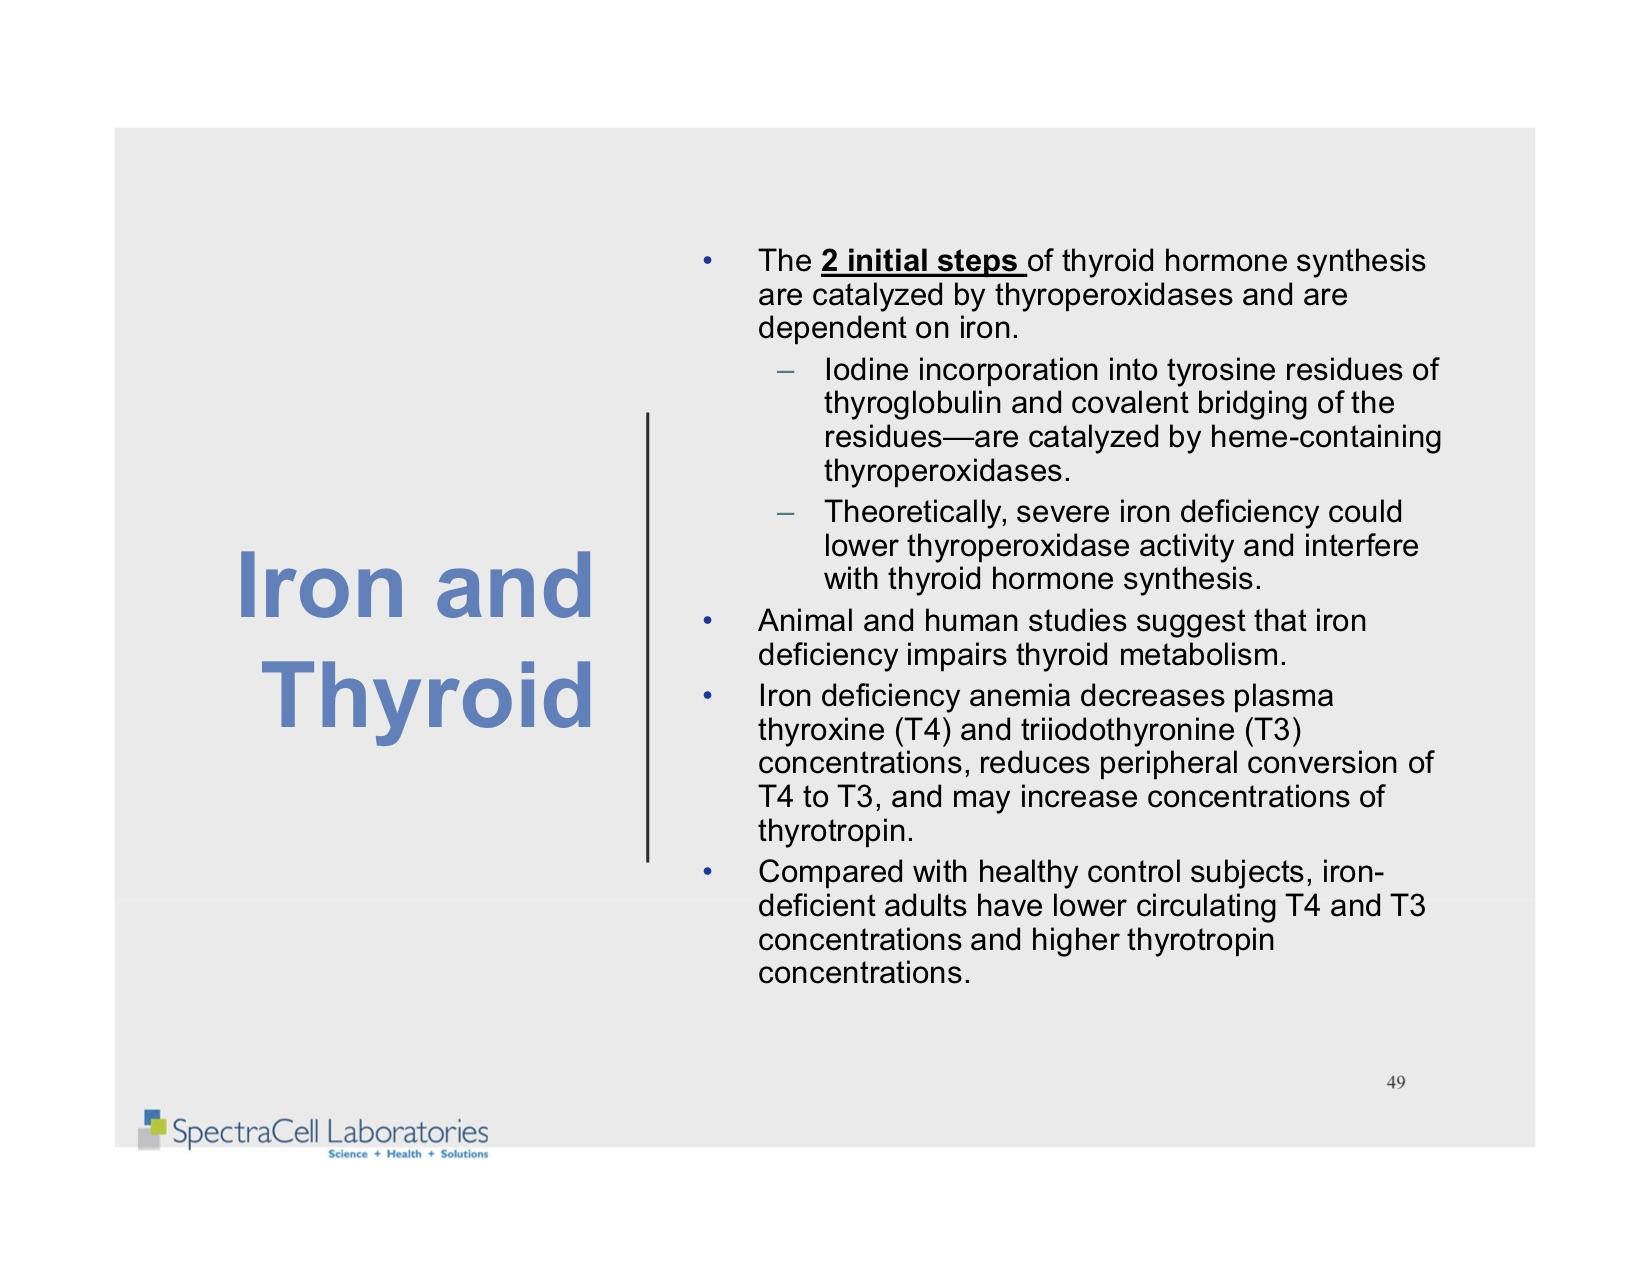 Autism and Thyroid slides 49.jpg